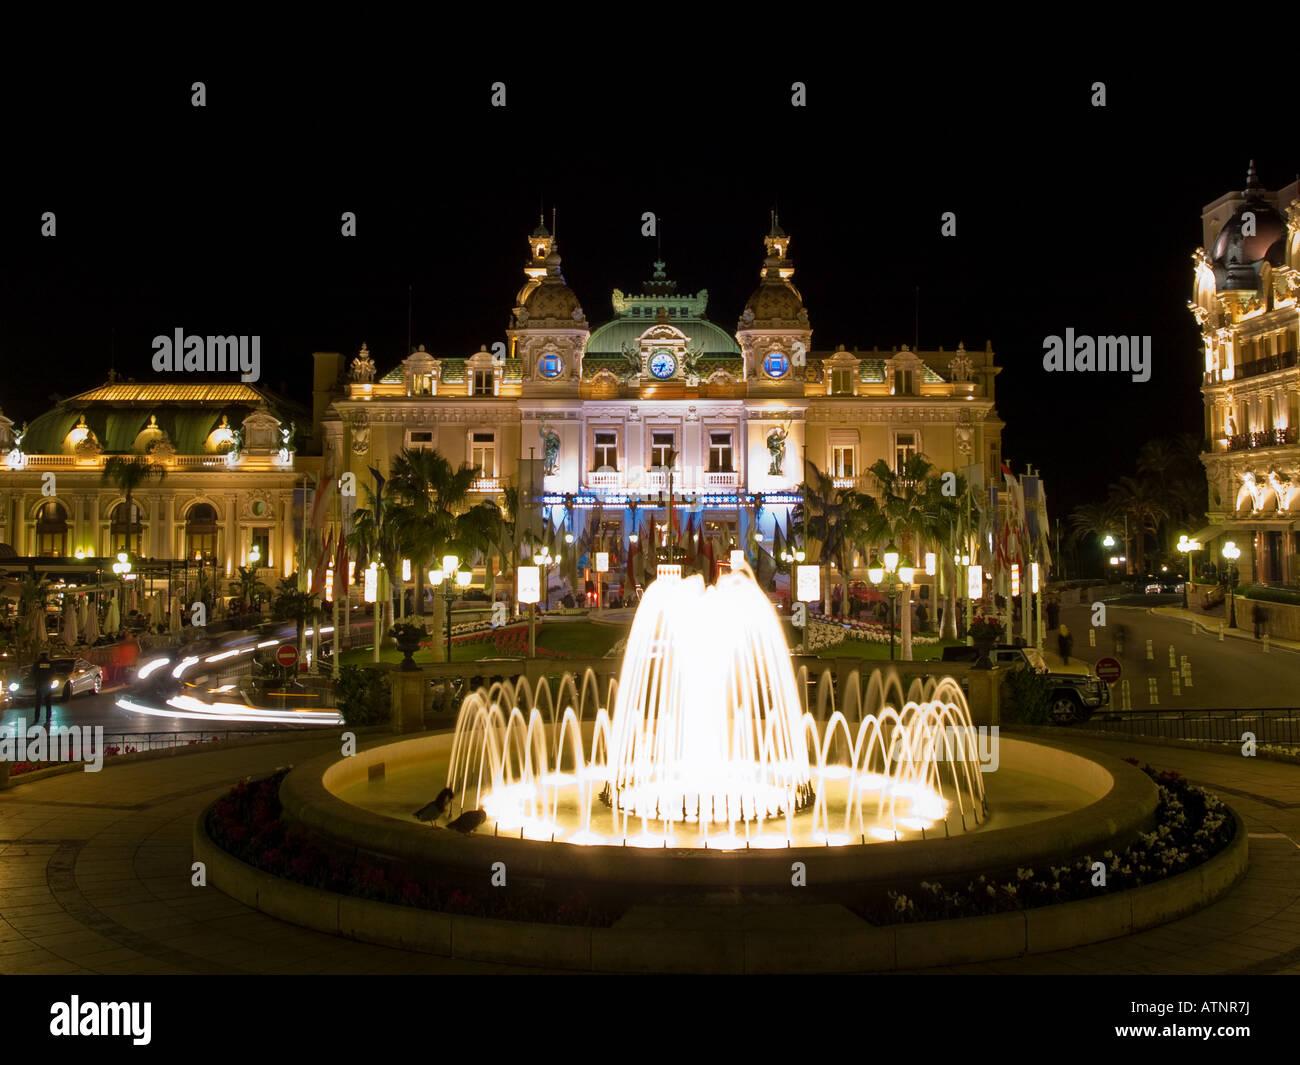 The high-rolling, famous Monte Carlo Casino at night.  Monaco. Stock Photo